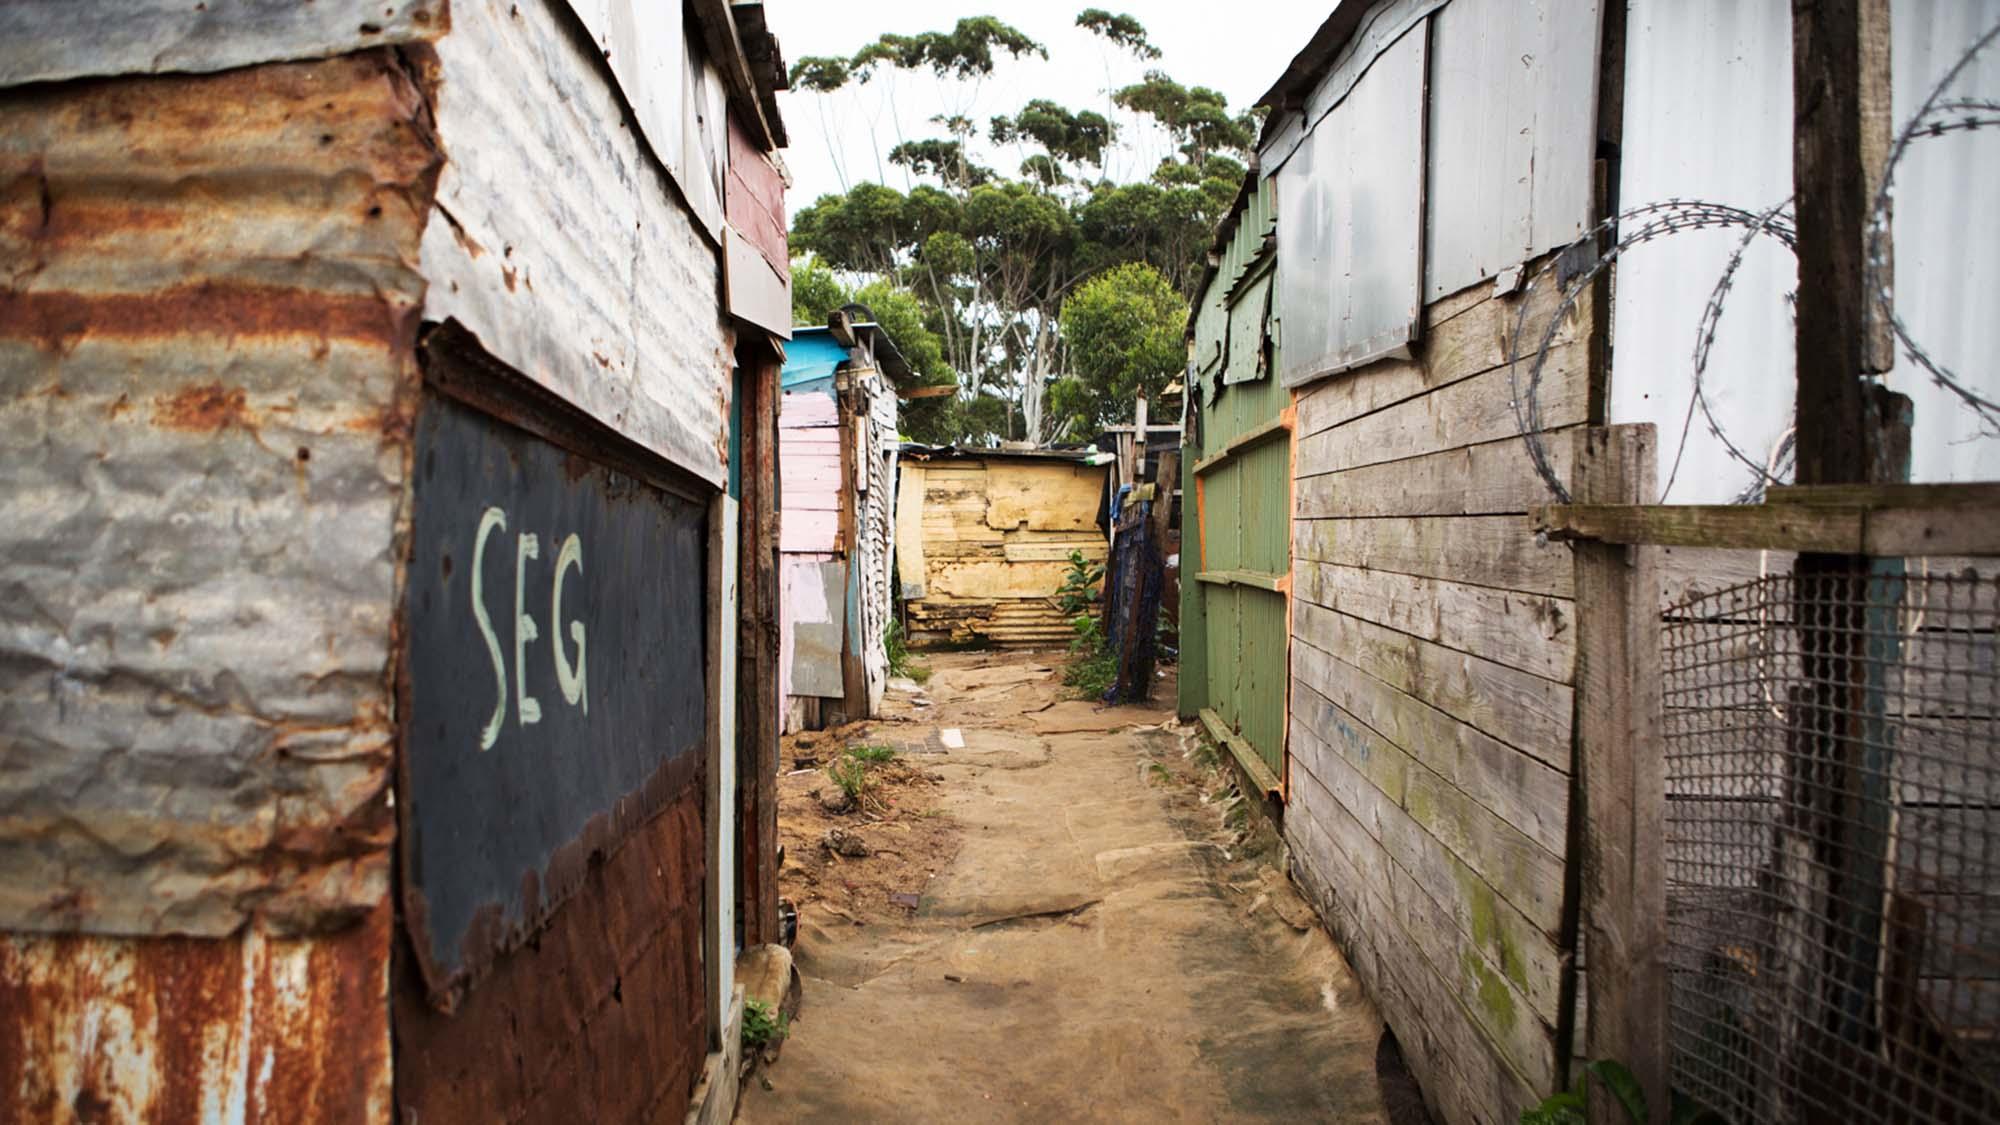 image of poor community